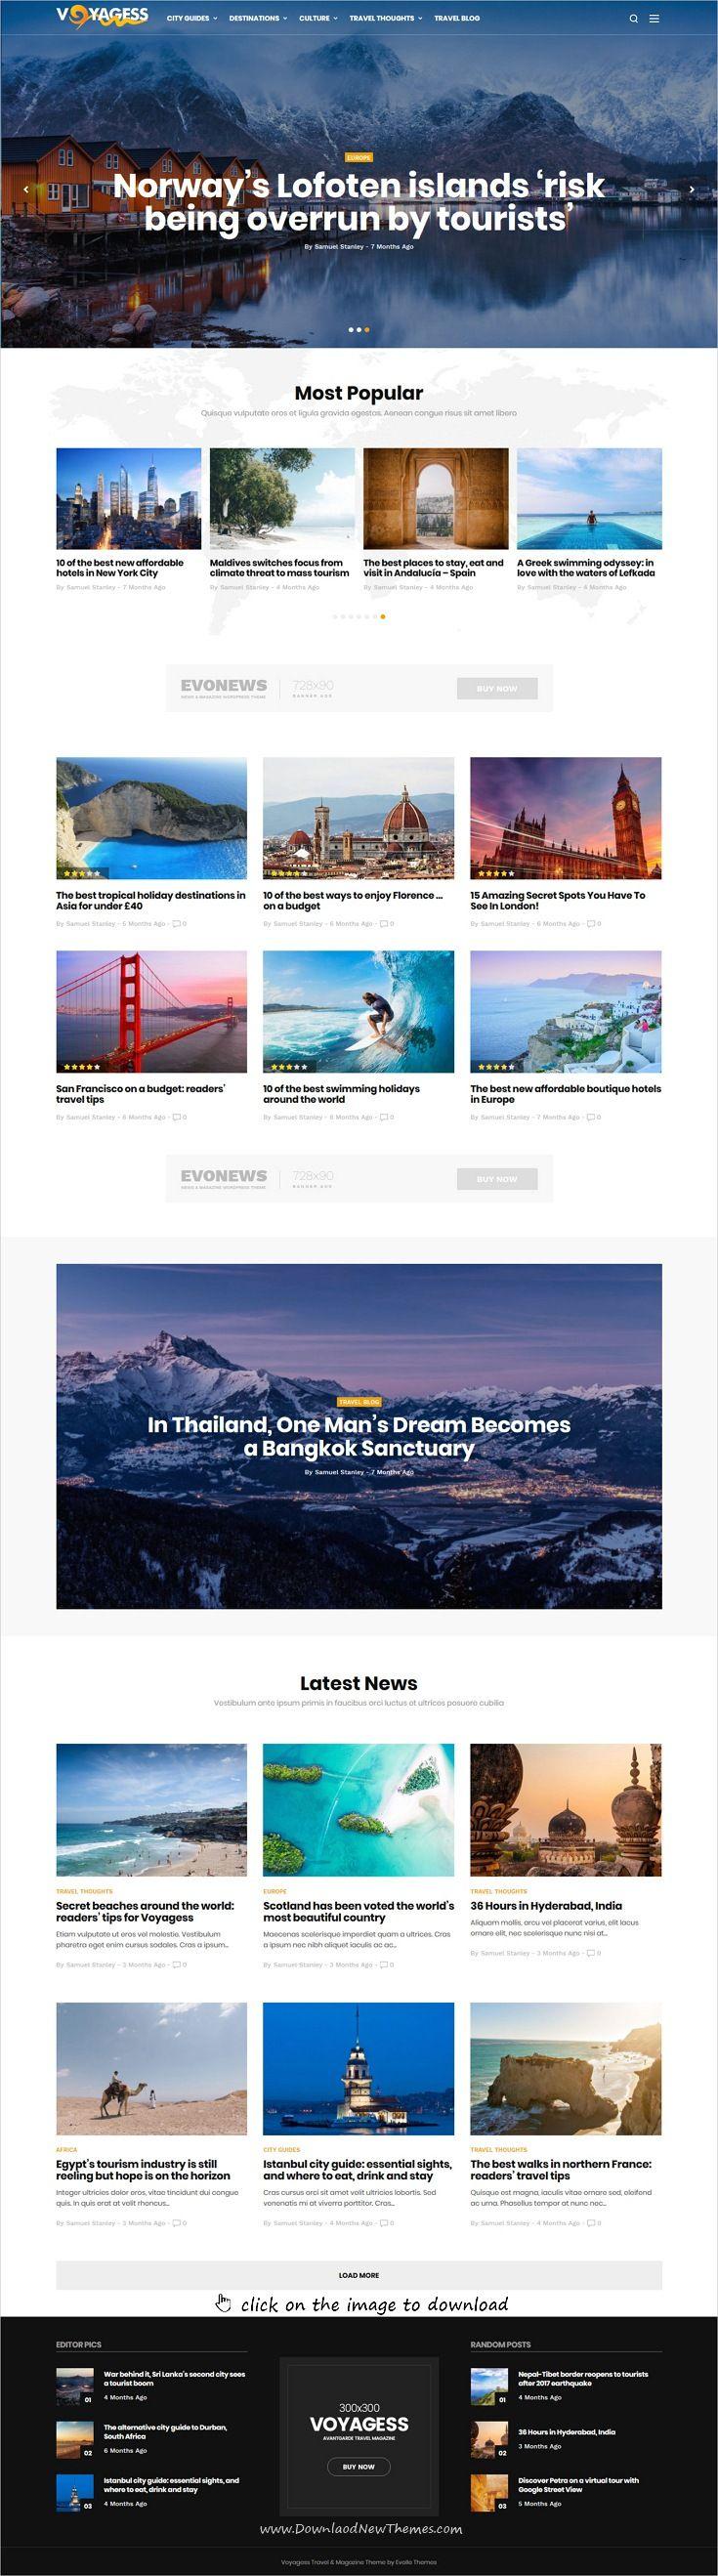 Evonews News Magazine WordPress Theme Pinterest